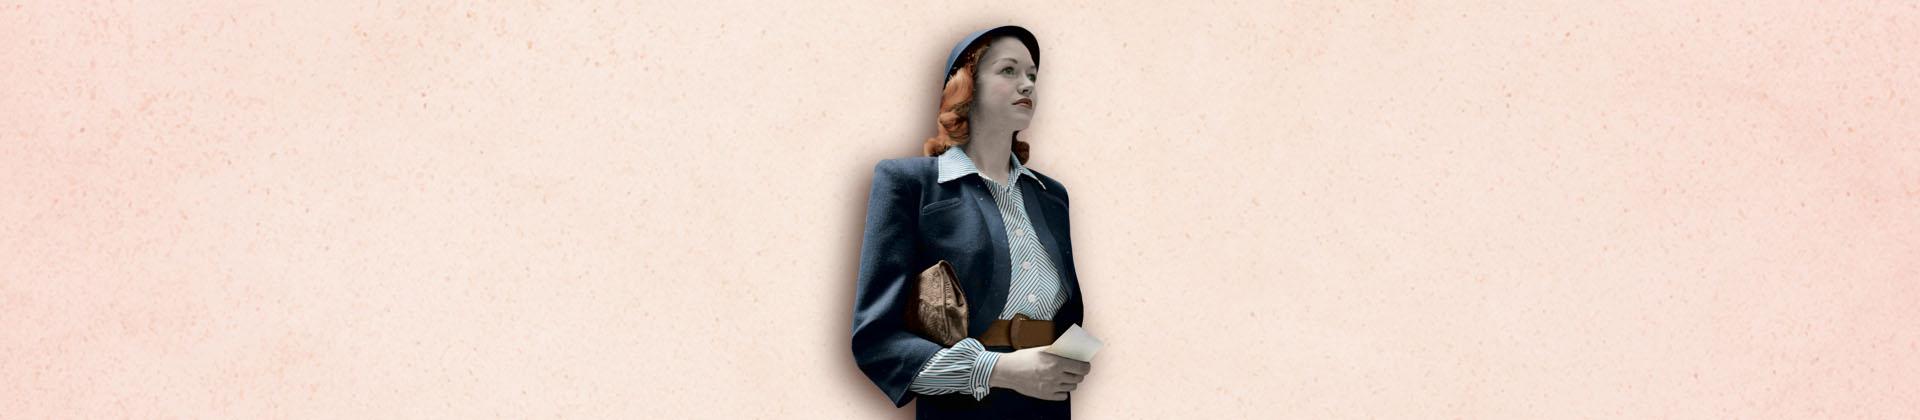 Ruby Flynn by Nadine Dorries